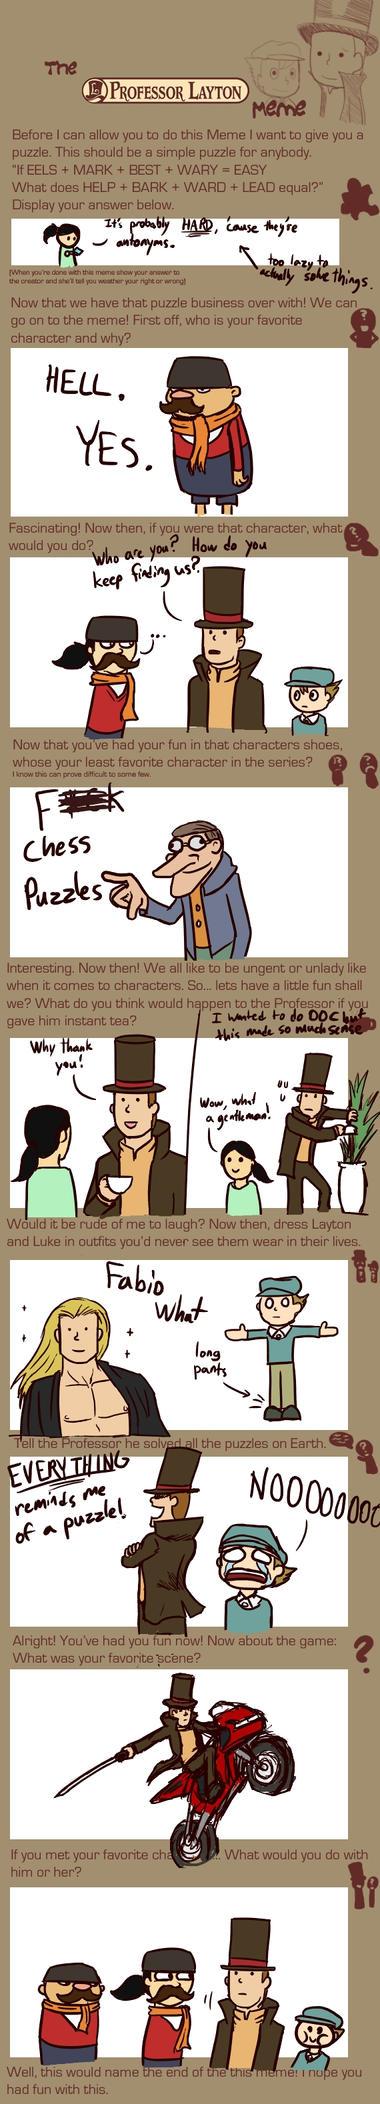 Professor Layton Meme by Pandadrake